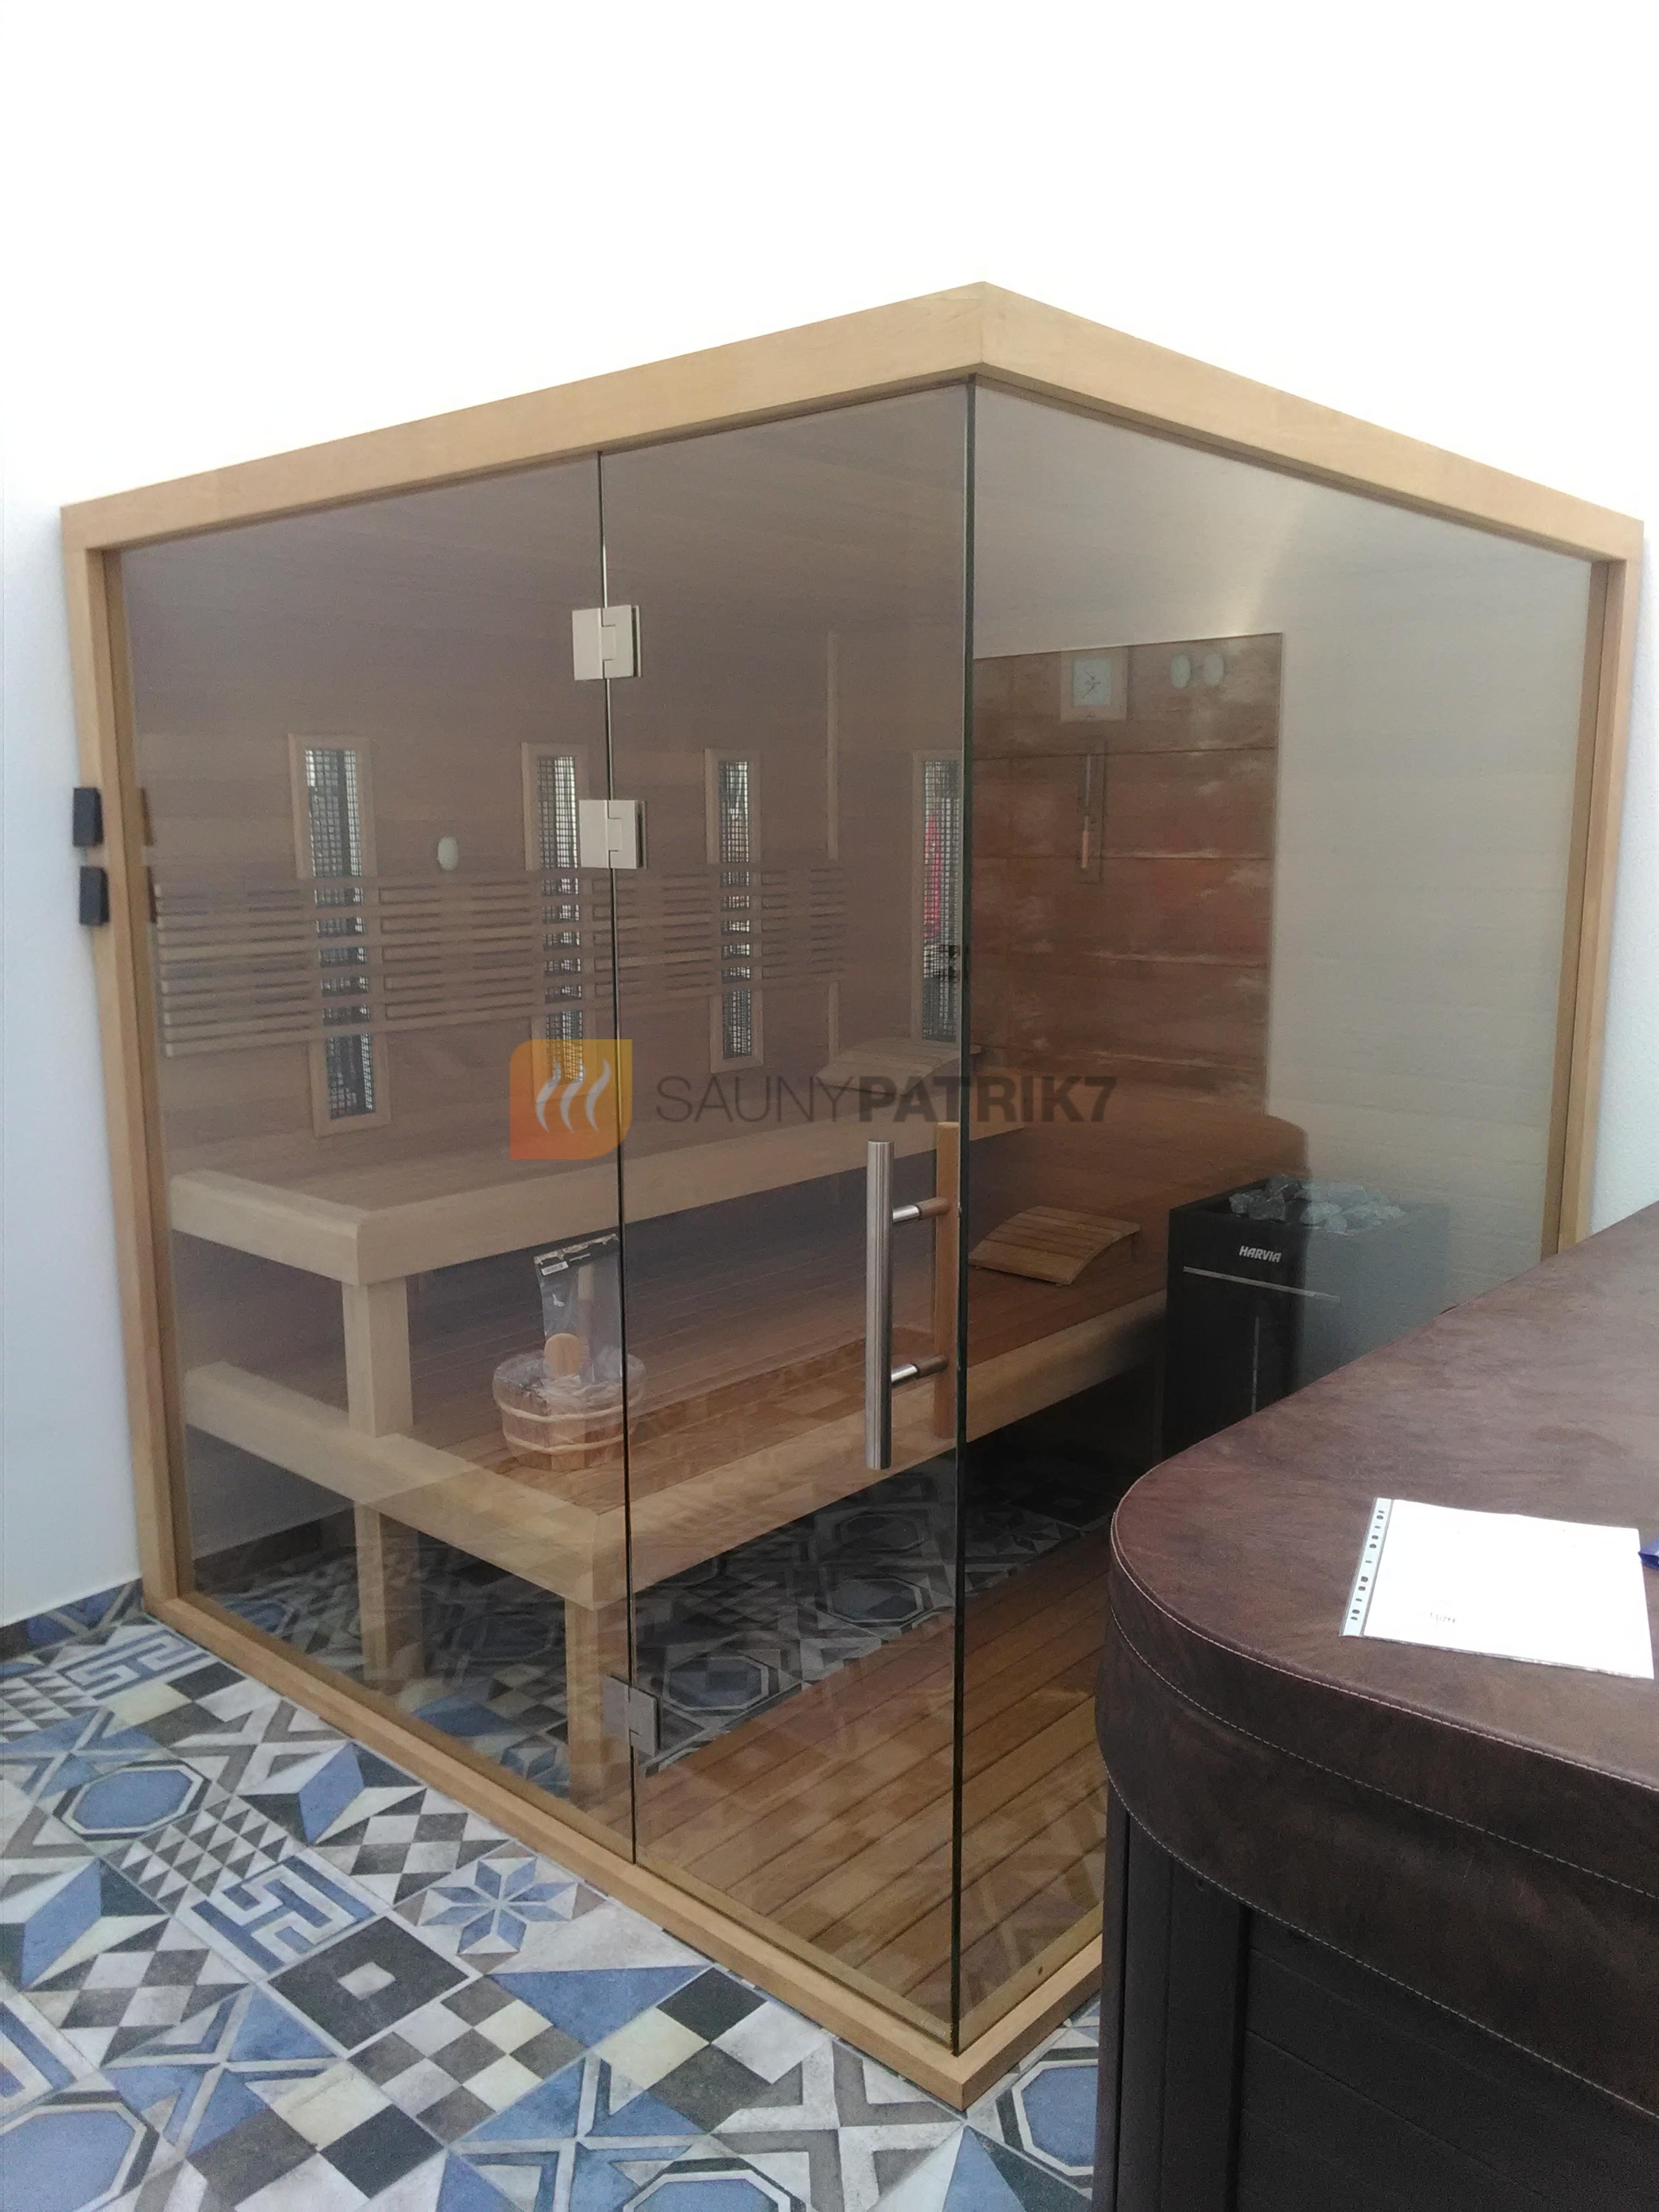 presklena kombinovana sauna - thermowood - sauny patrik 7